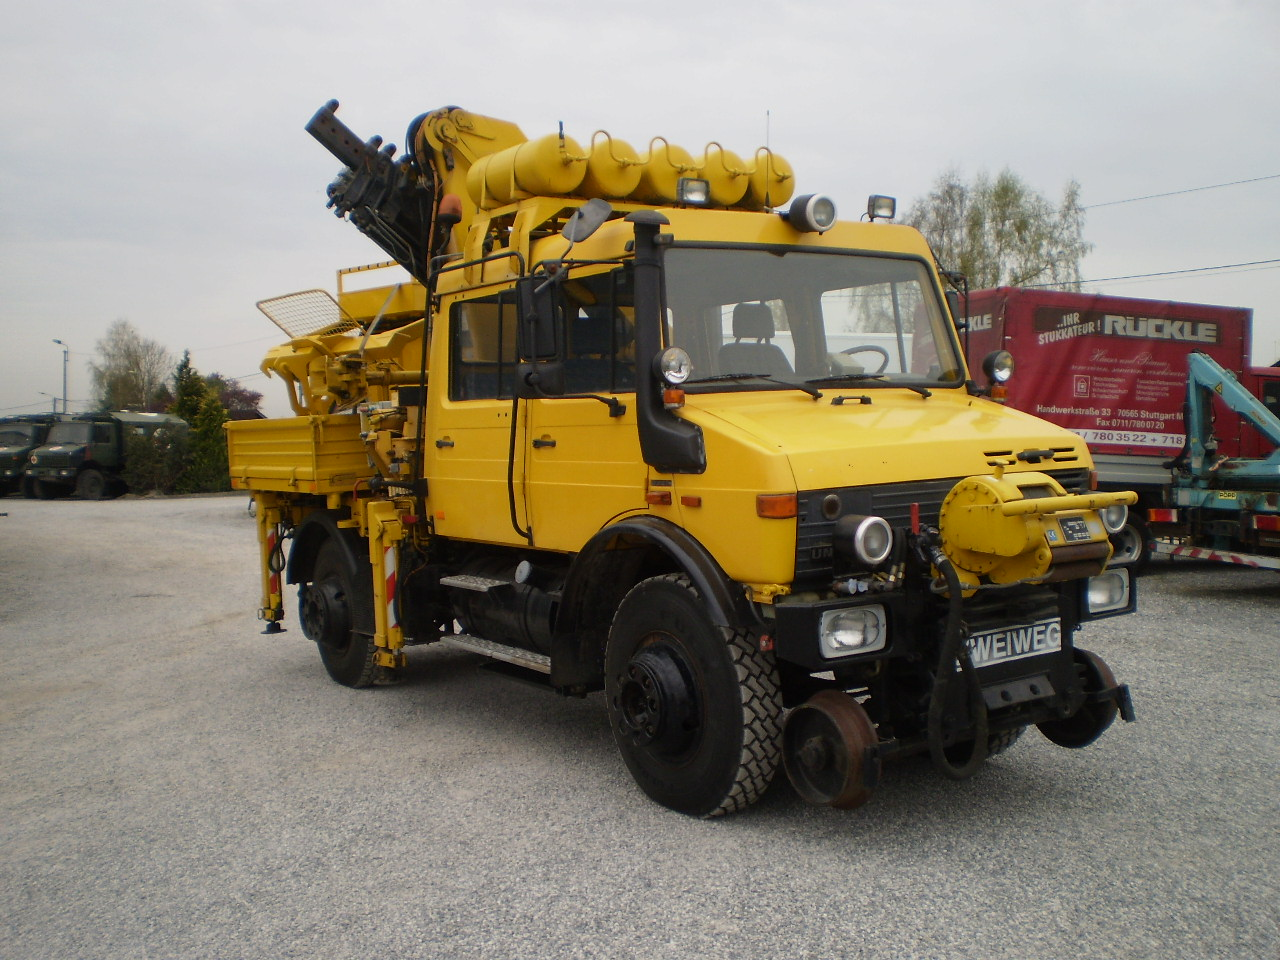 Mercedes-Benz Unimog 1650 ZW rail route / rail road - Year: 1996 - Other trucks - ID: 4B739977 ...